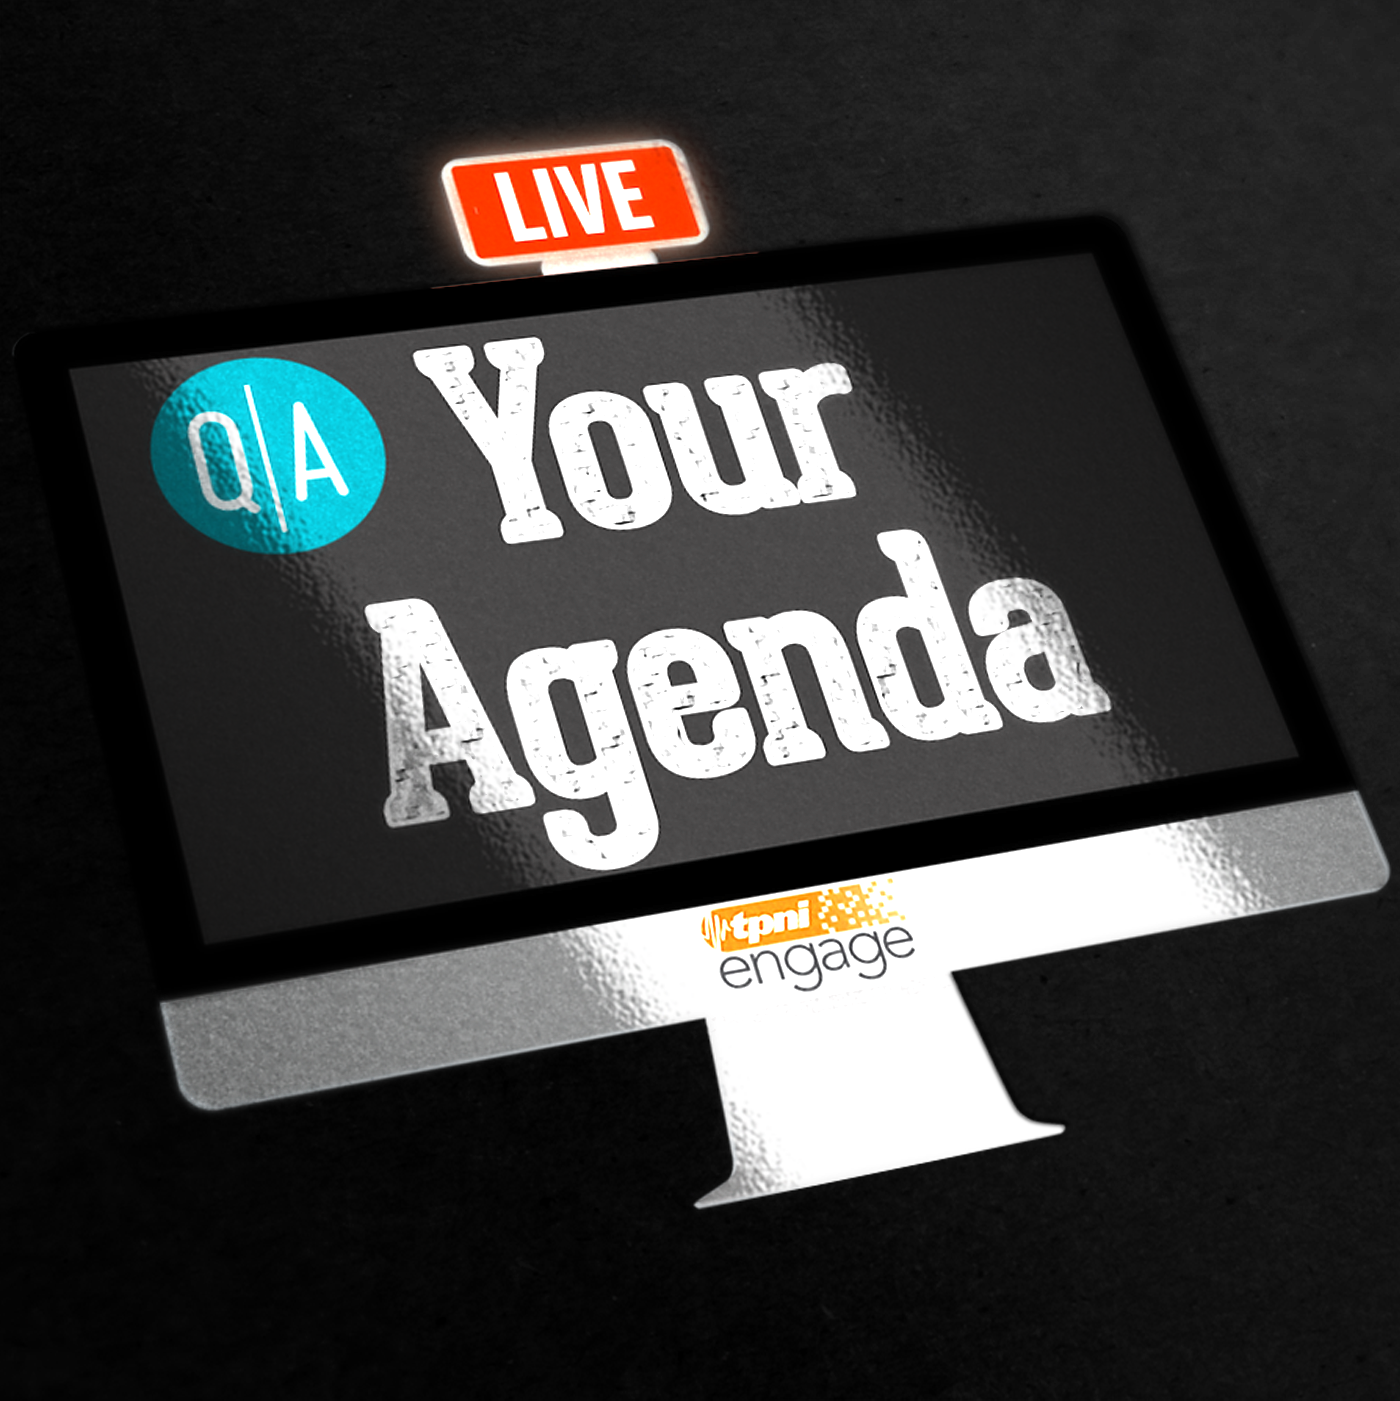 <![CDATA[TPNI Engage - Your Agenda Training]]>